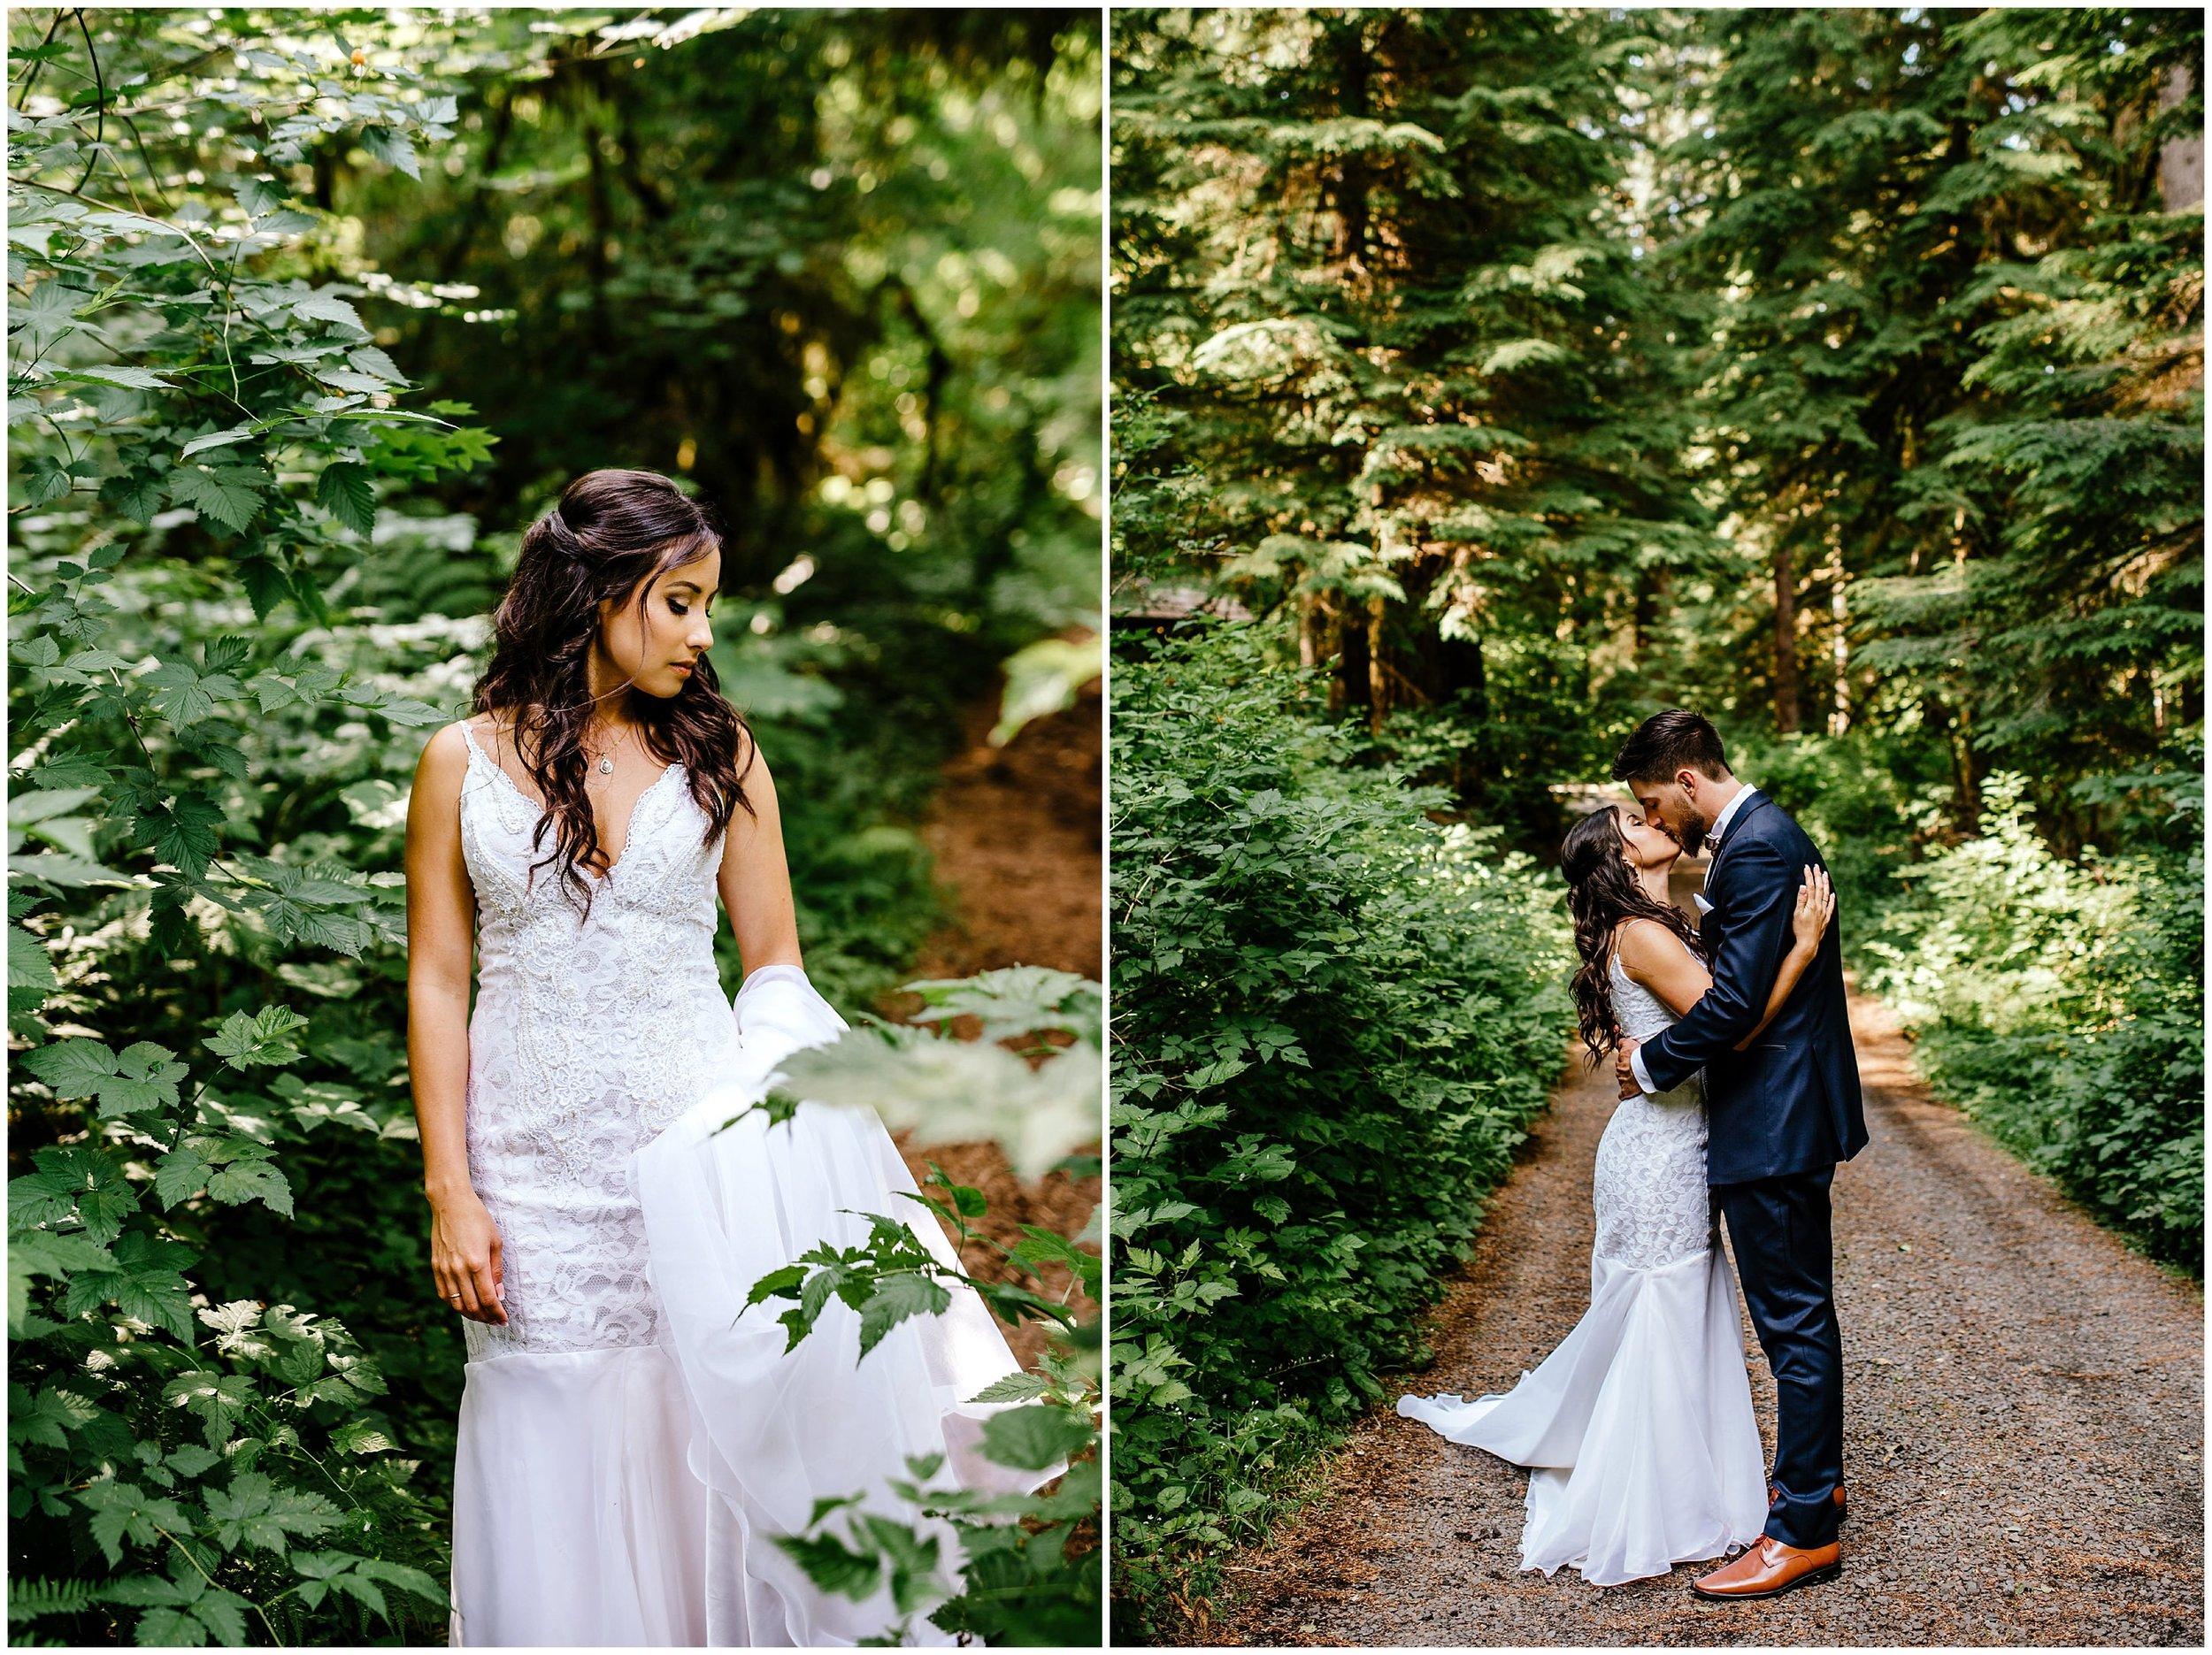 Silver-falls-state-park-wedding-74.jpg